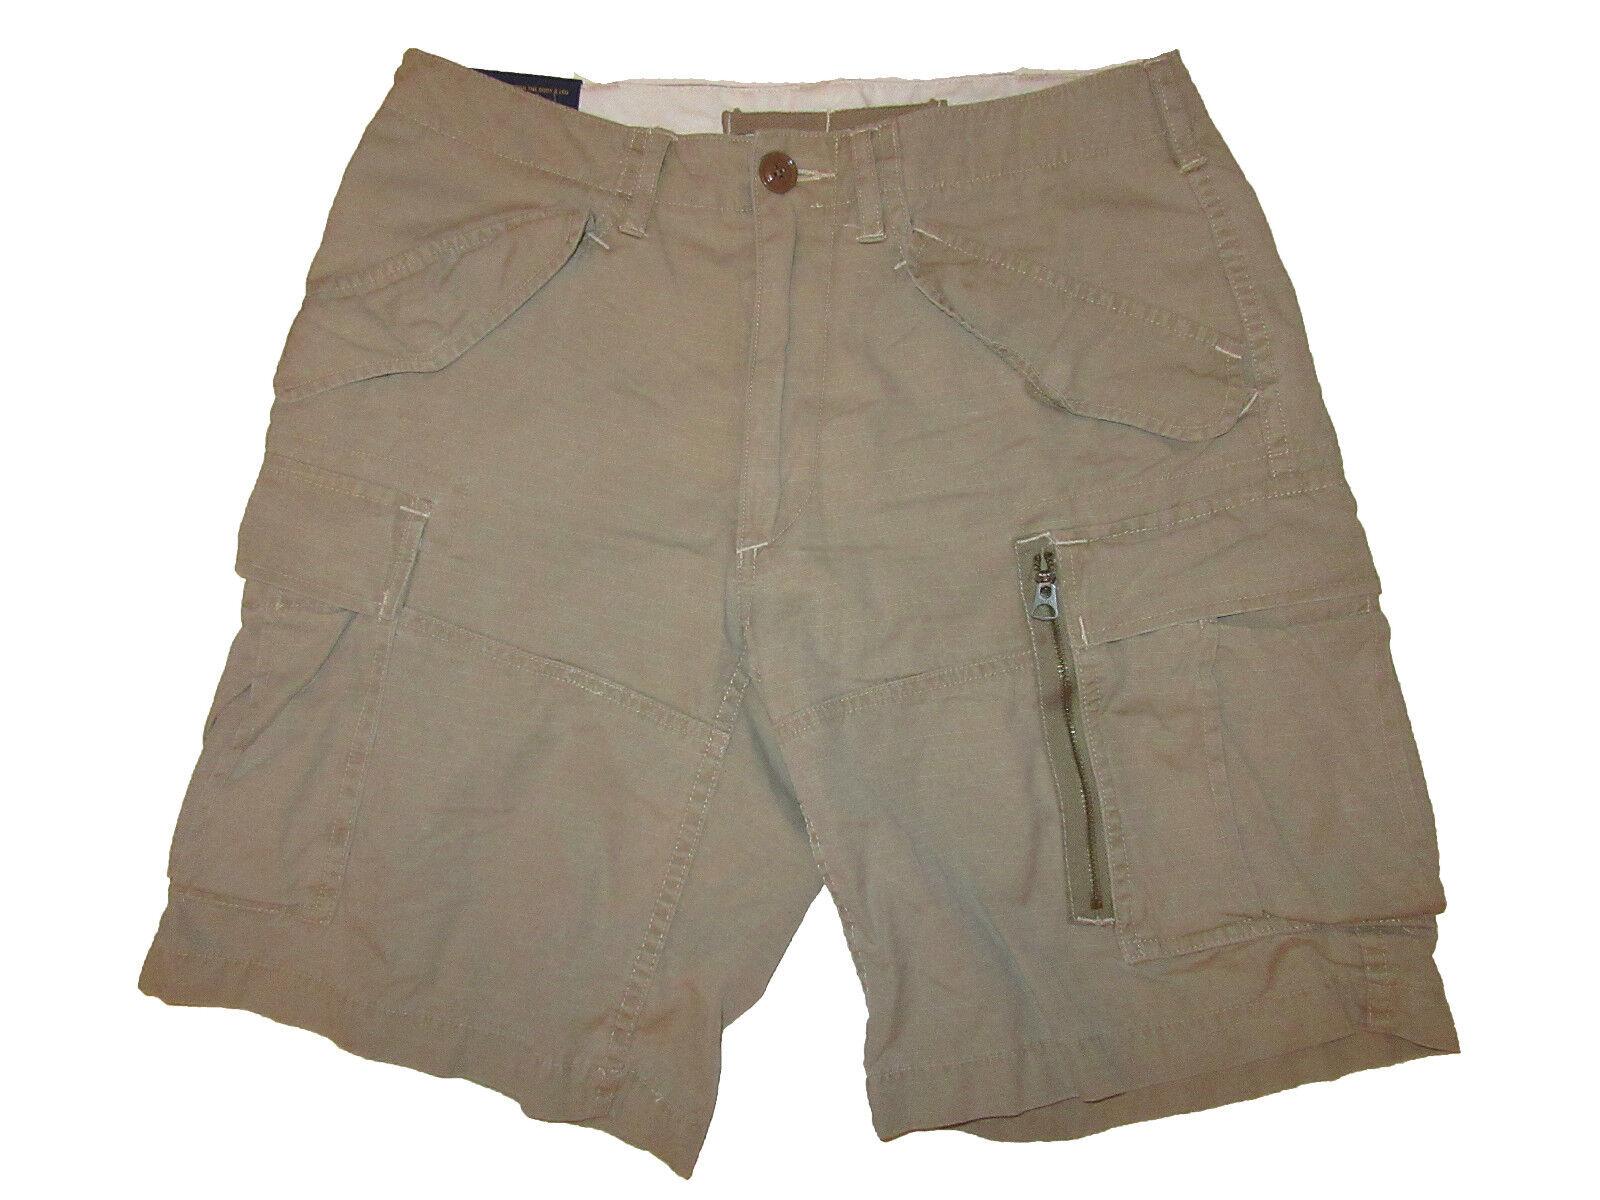 Polo Ralph Lauren Military Khaki Gunner Cargo Shorts 33